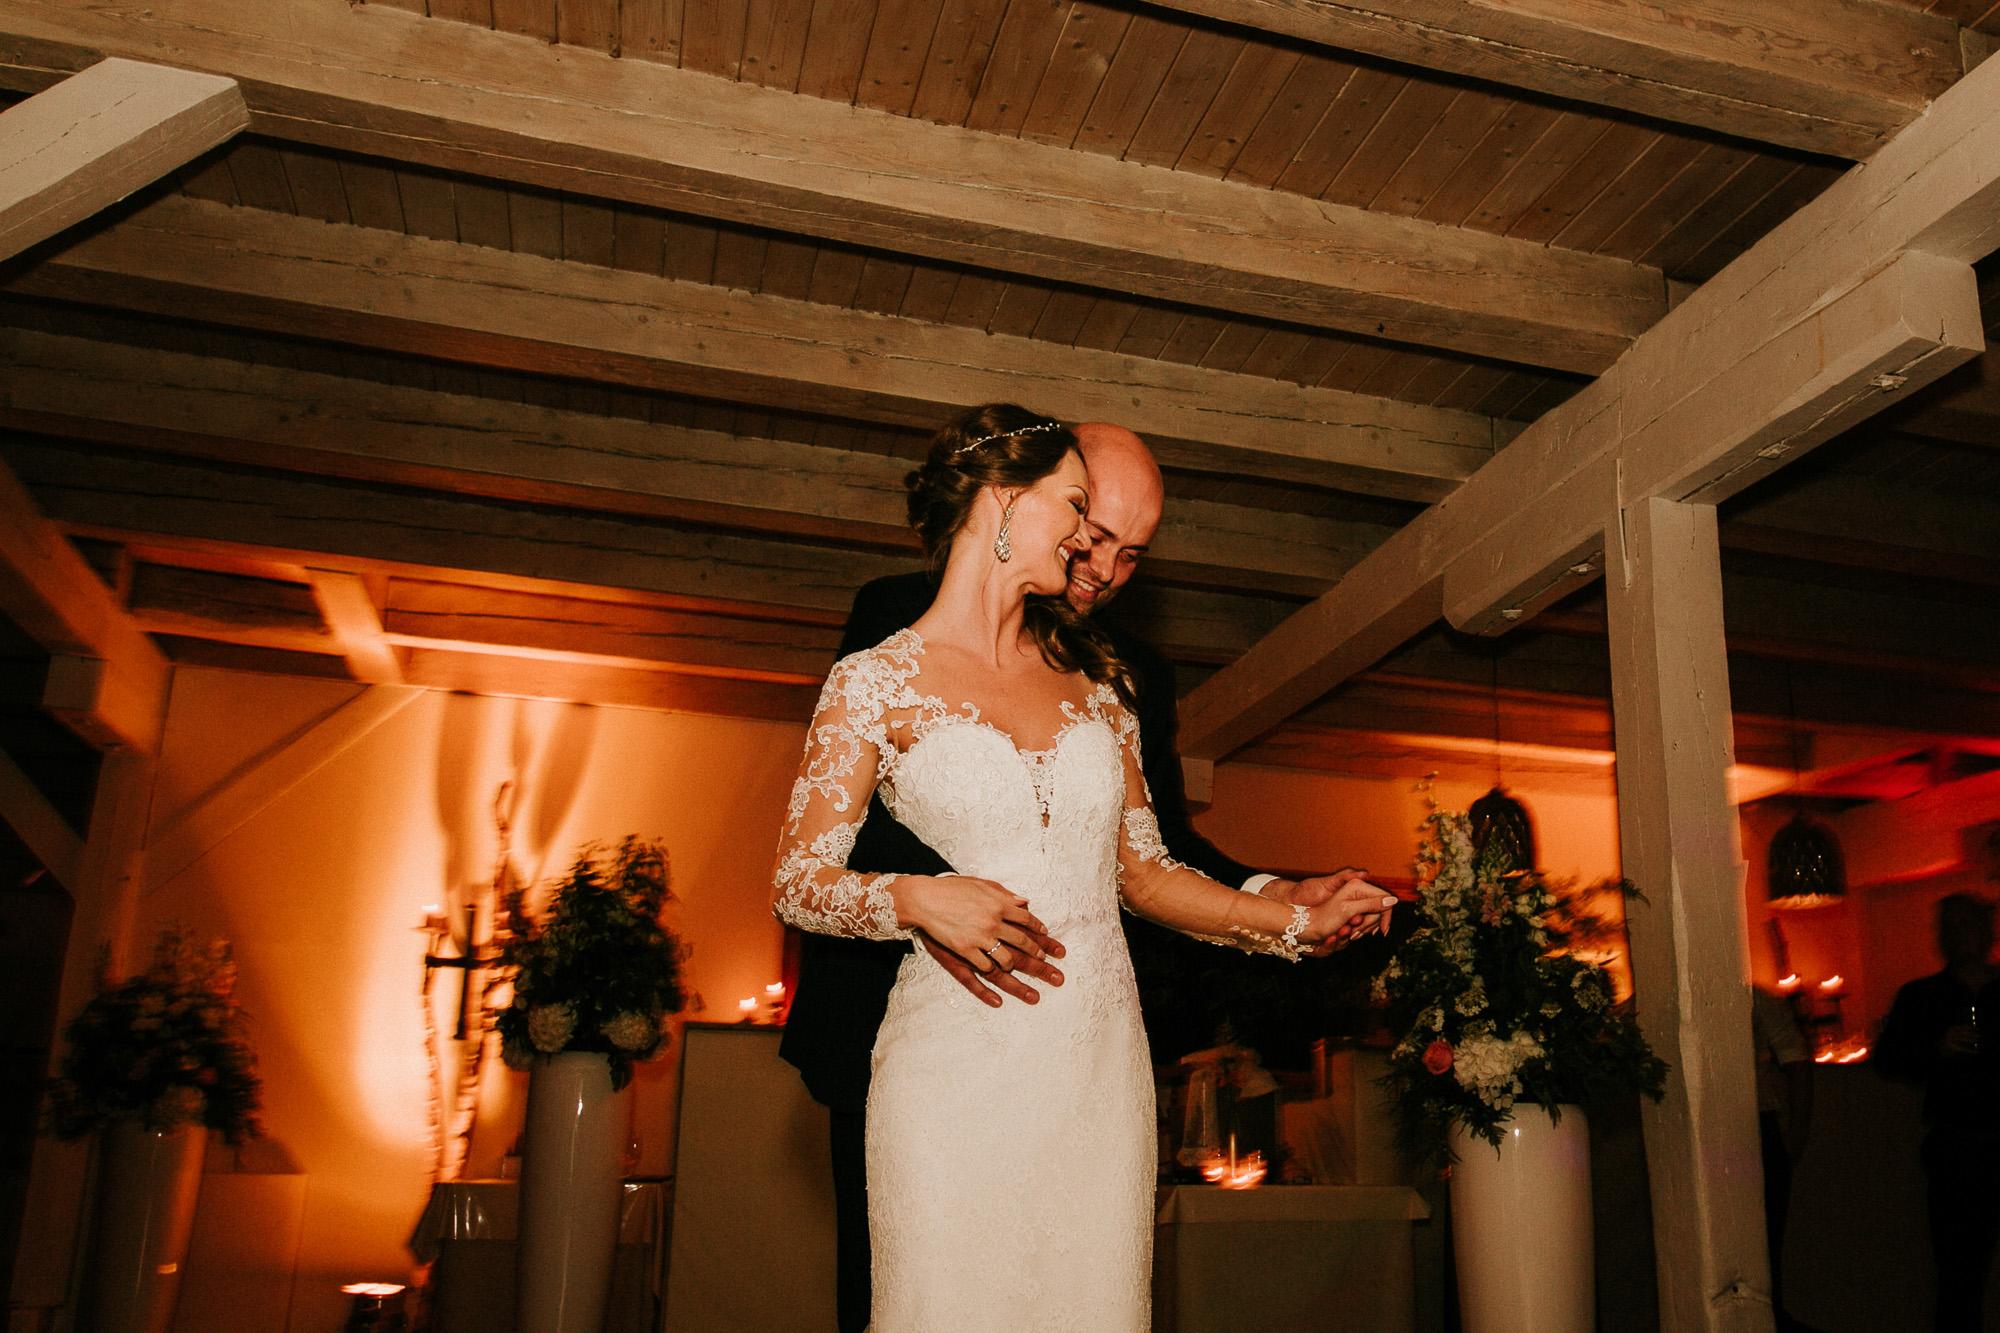 DanielaMarquardtPhotography_Hochzeitsfotograf_Düsseldorf_Köln_Mallorca_Bayern_Austria_Harz_Wedding_AileenundLennart_Weddingphotographer_Ibiza_Tuskany_Italien_Toskana_Portugal_Lissabon270